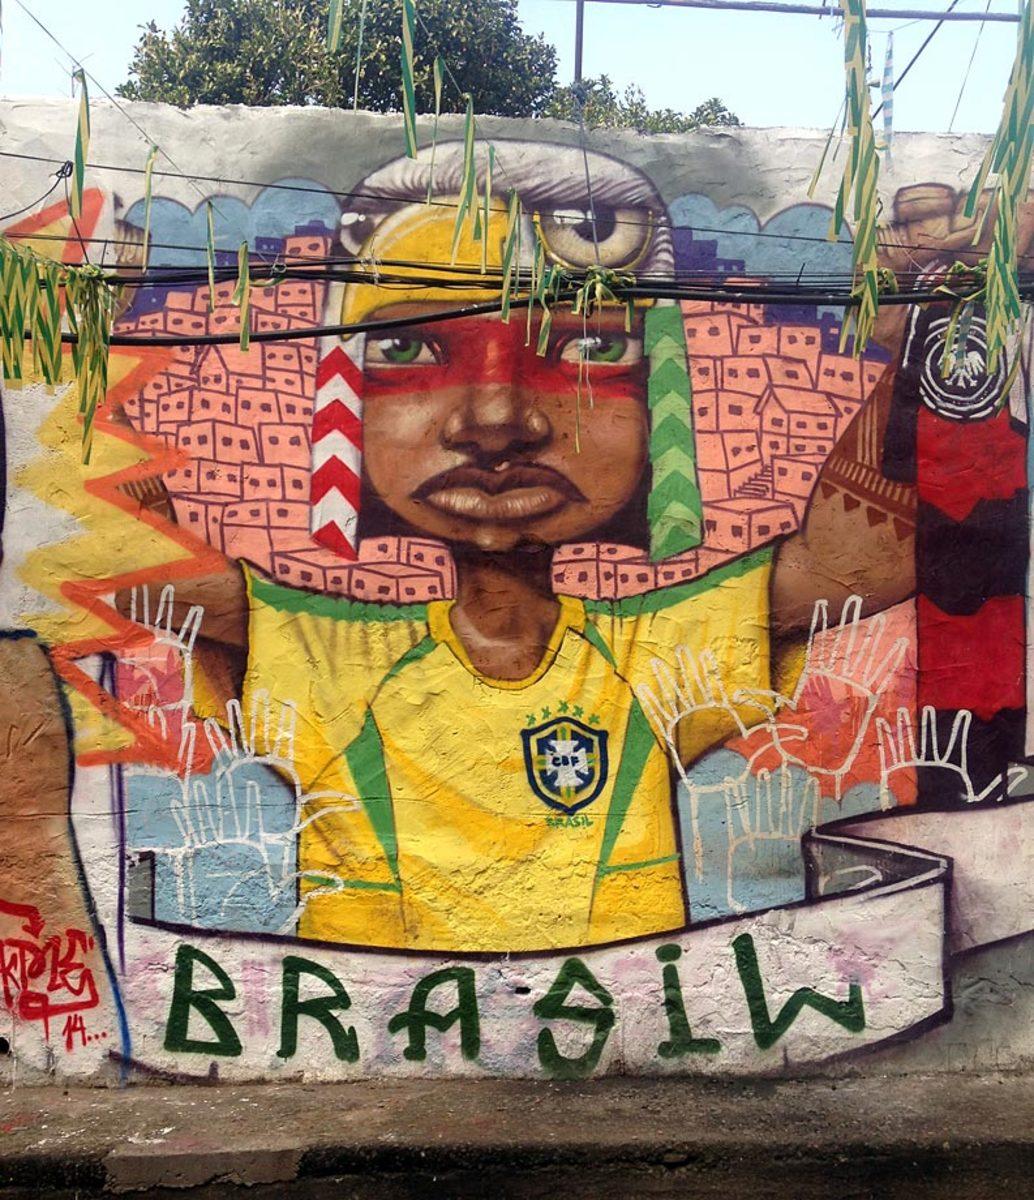 soccer-graffiti-mural-rio-IMG_8578.jpg